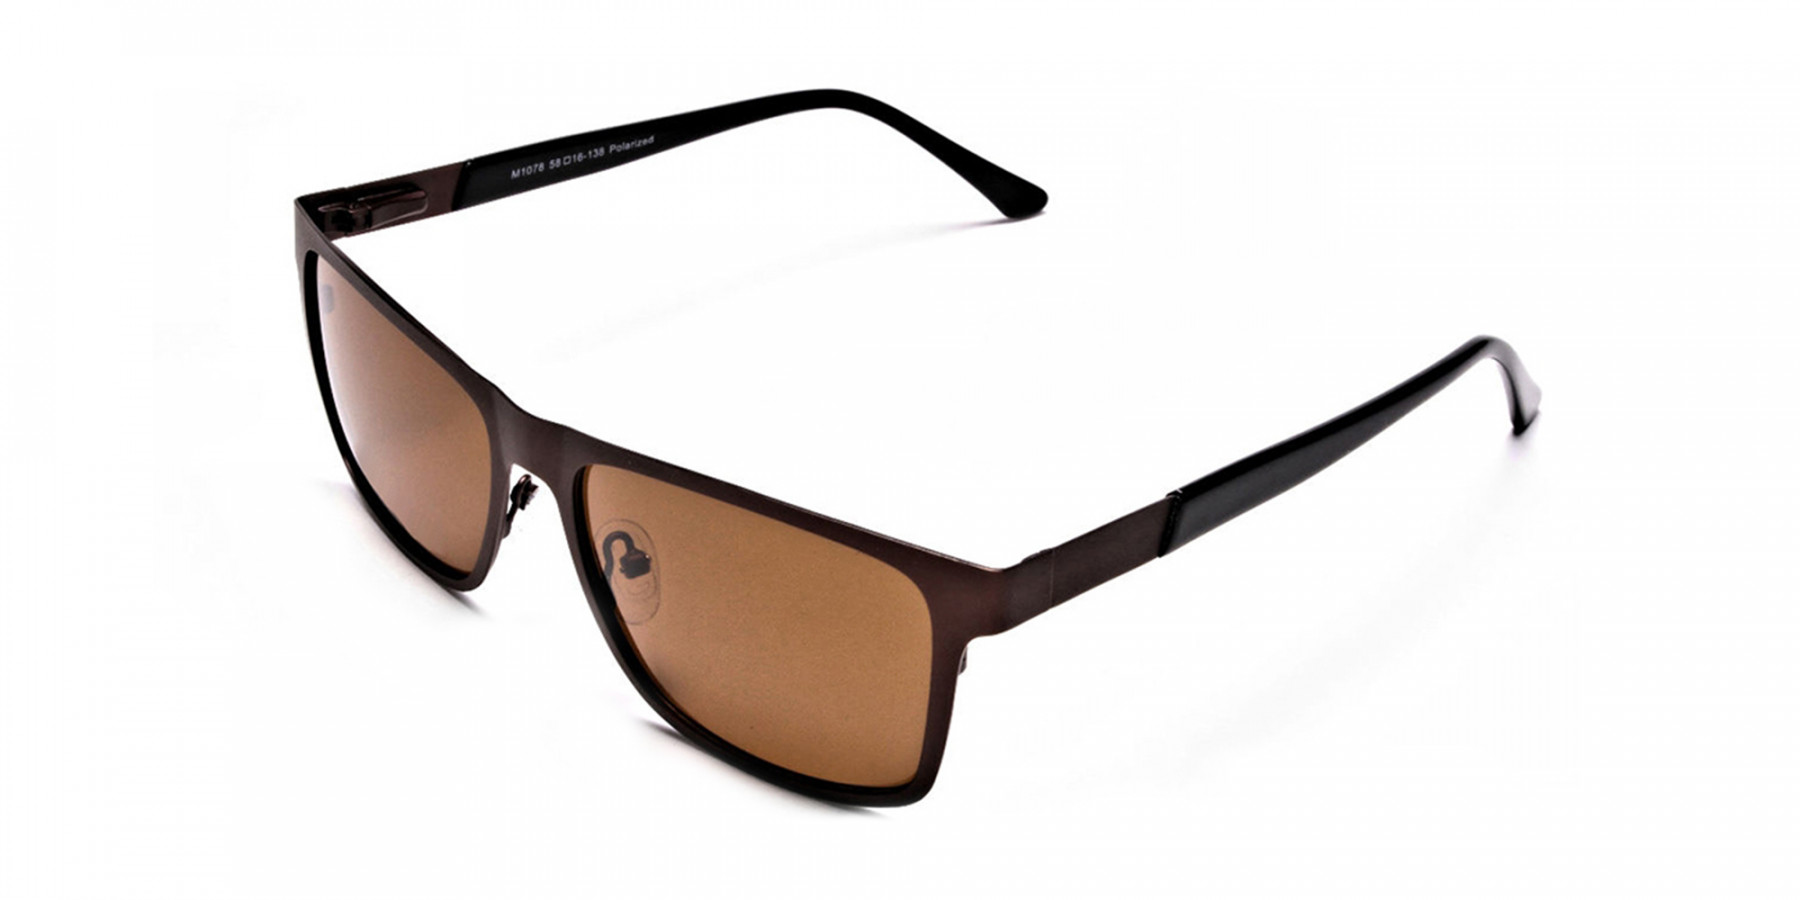 Brown Wayfarer Sunglasses for Men and Women - 2